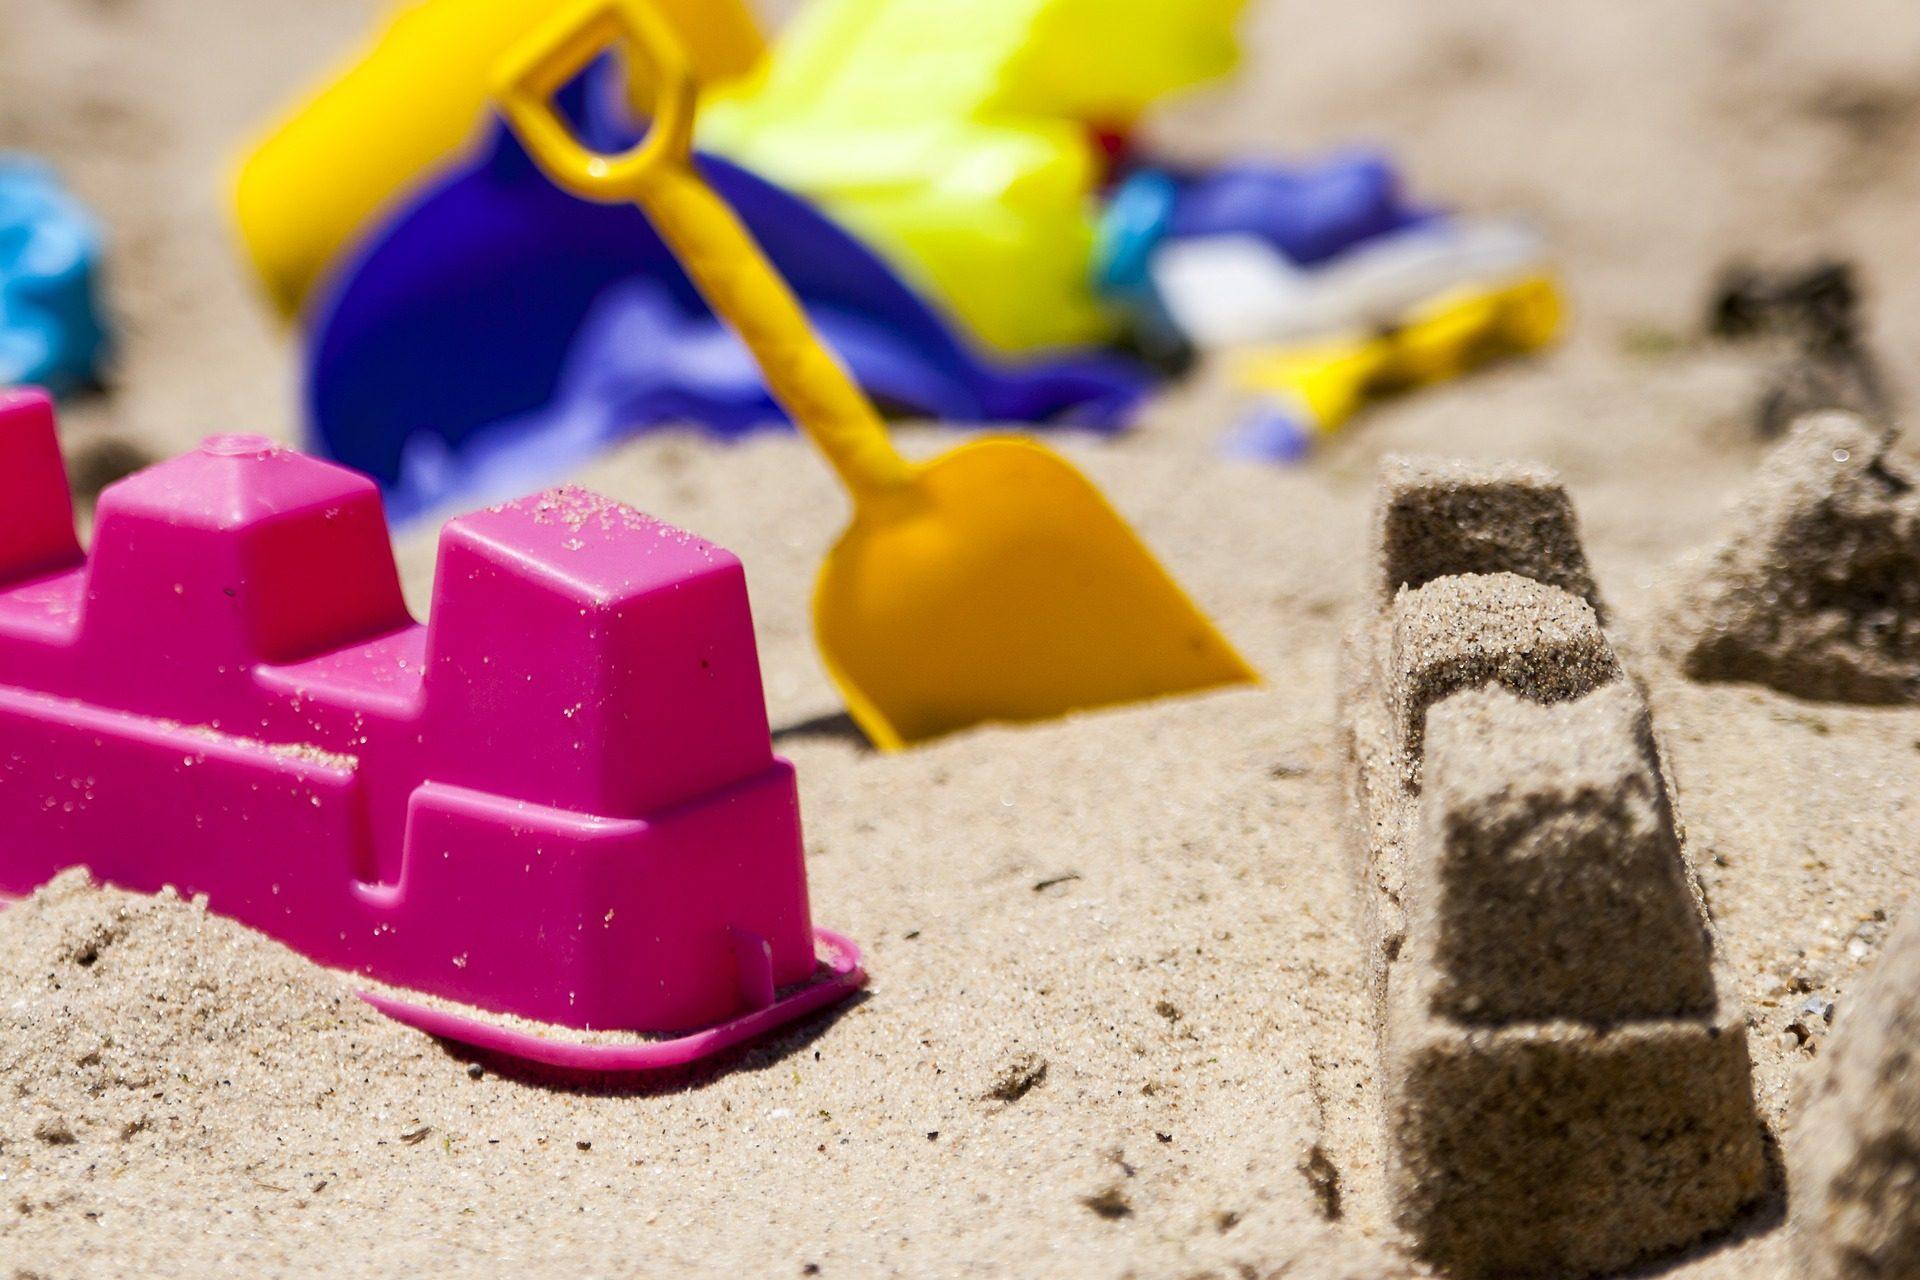 Sand, Strand, Spielzeug, Kunststoff, bunte, Spiel - Wallpaper HD - Prof.-falken.com